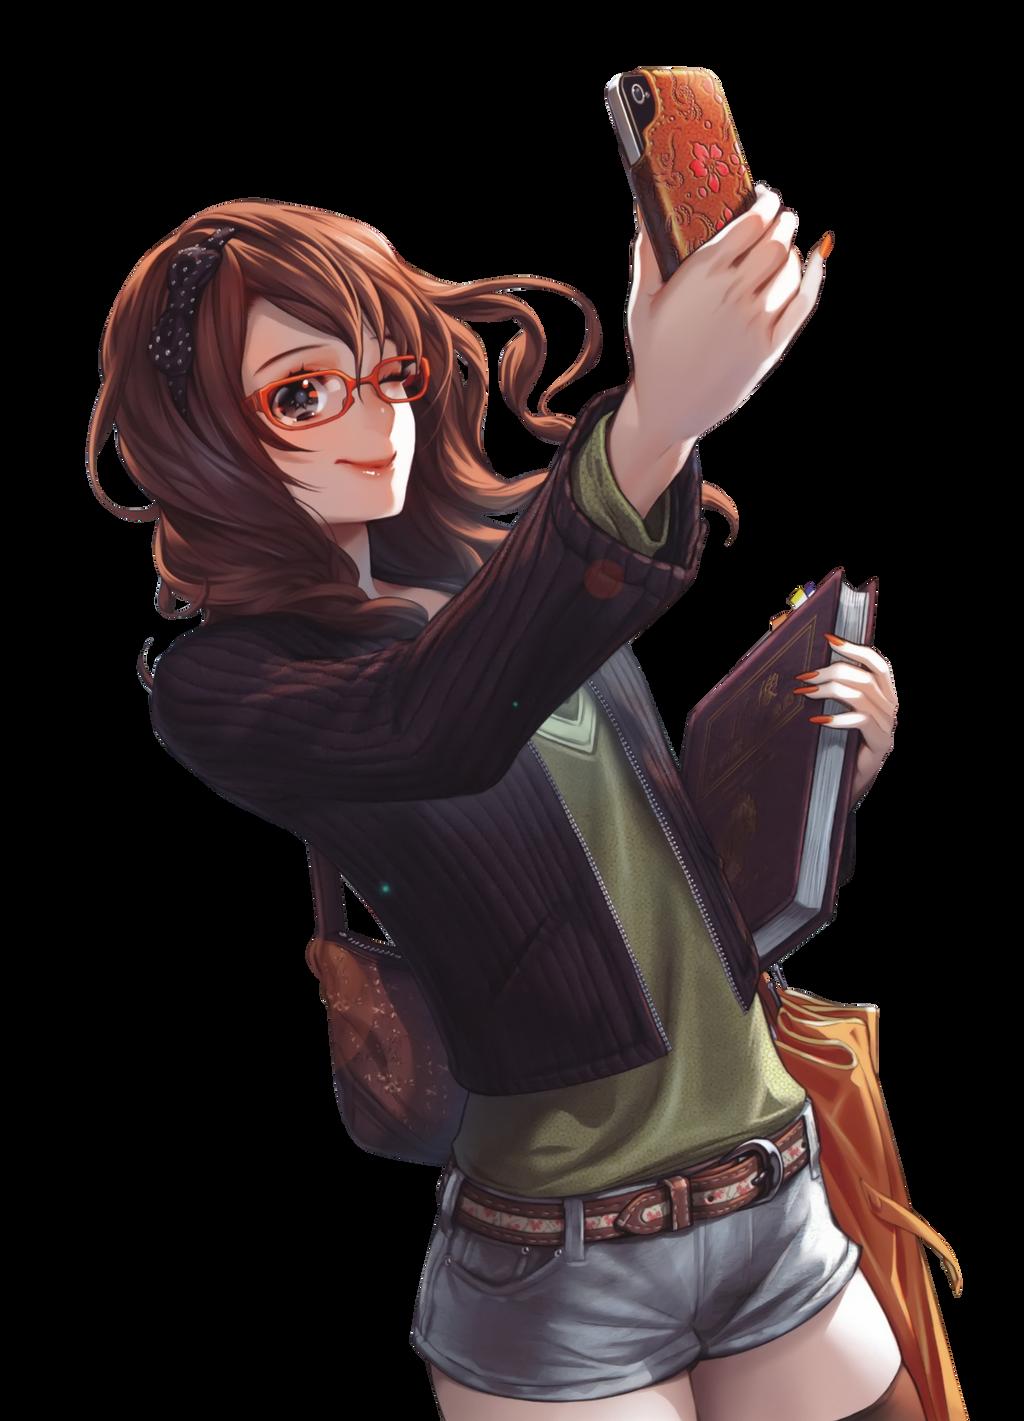 [NPC] Nicole Drew Brown_hair_anime_girl_glasses_phone_render_png_by_seikiyukine-d85eu8p